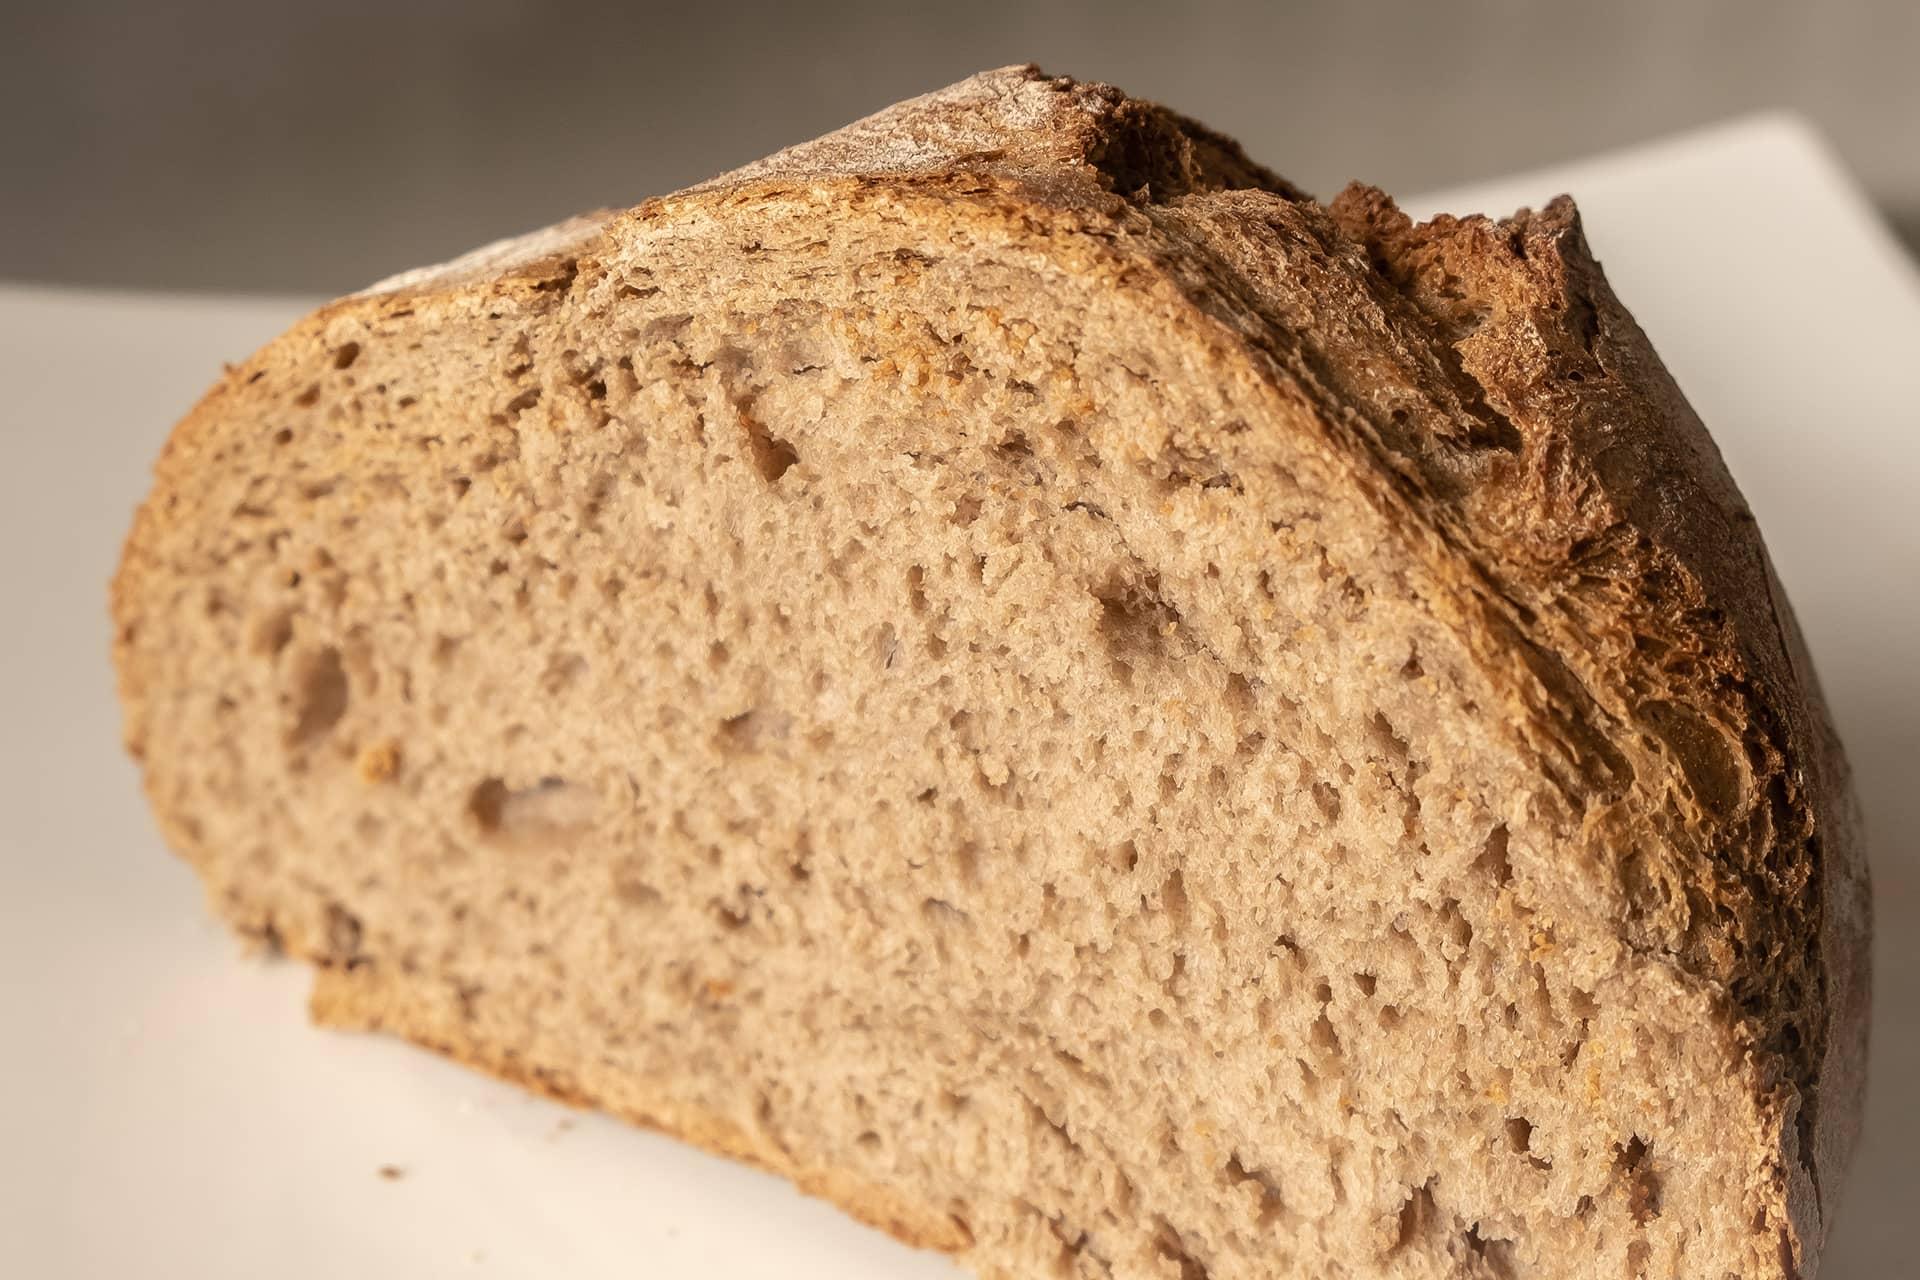 Pan de trigo y centeno de Banuncias